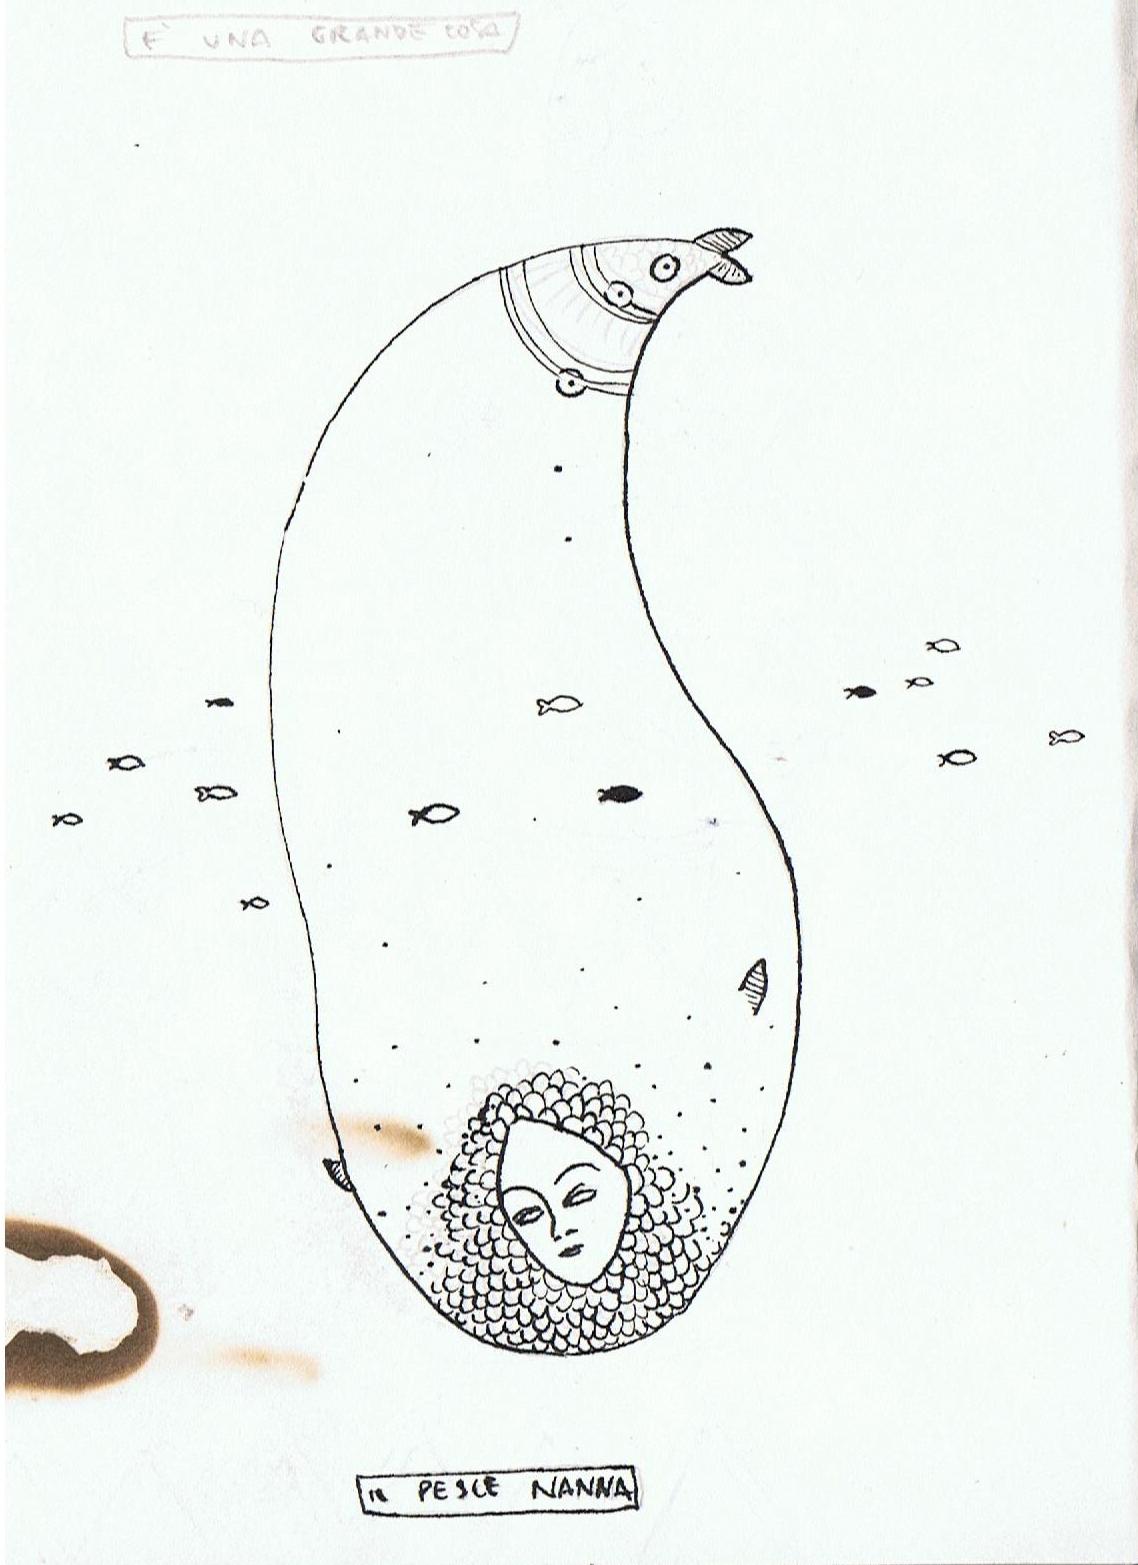 Pesce nanna